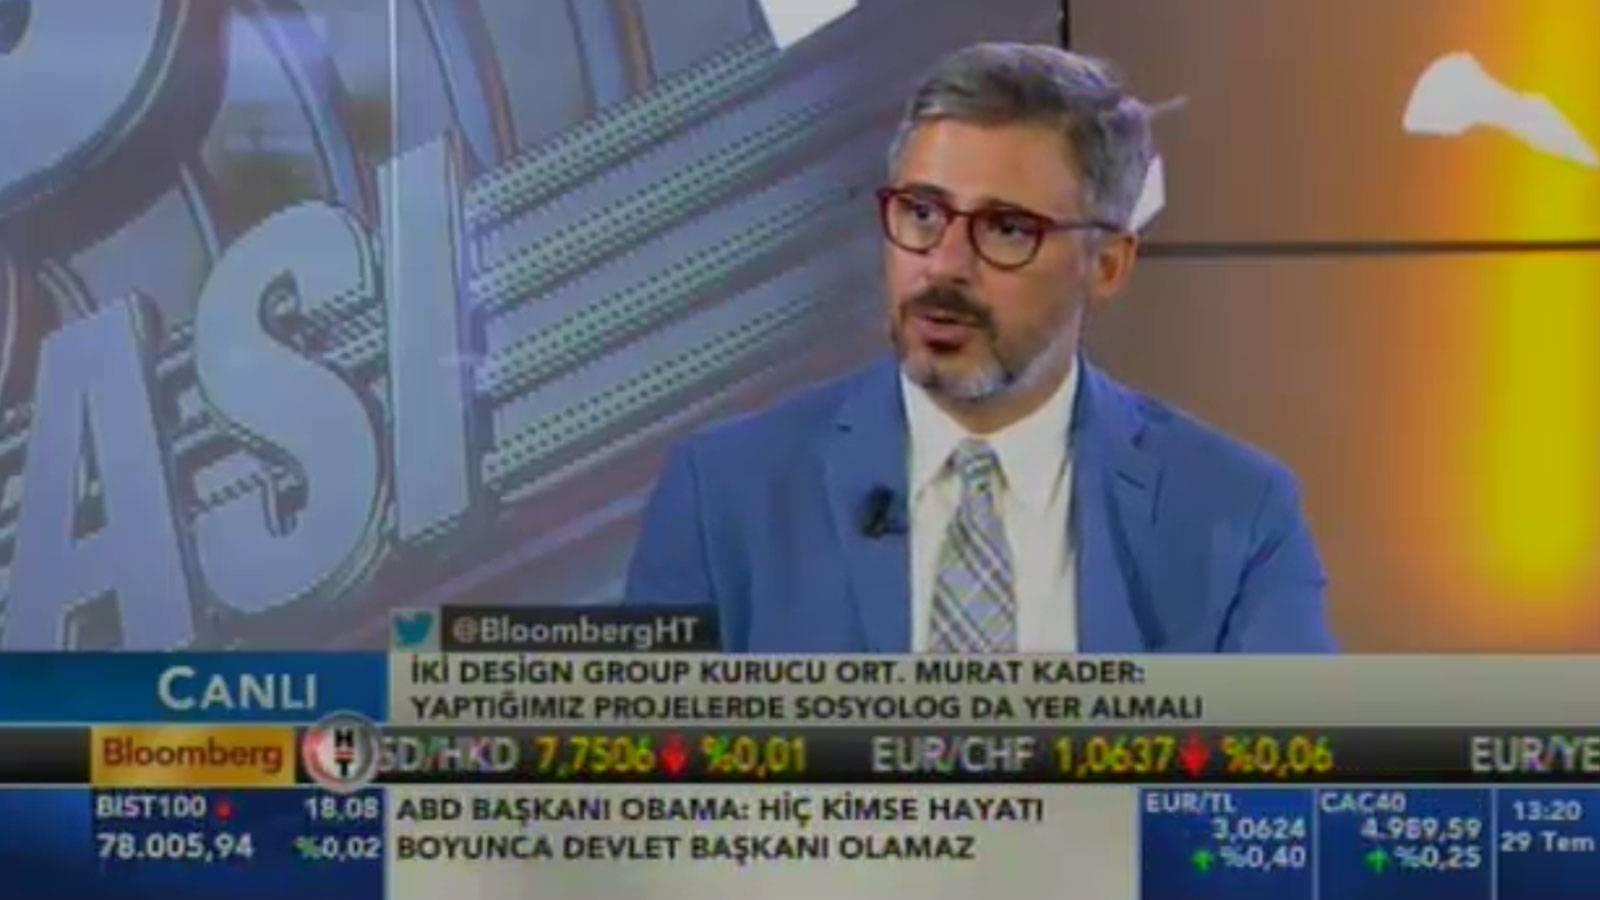 Murat Kader was guest of İş Dünyası on BloombergHT at noon schedule.